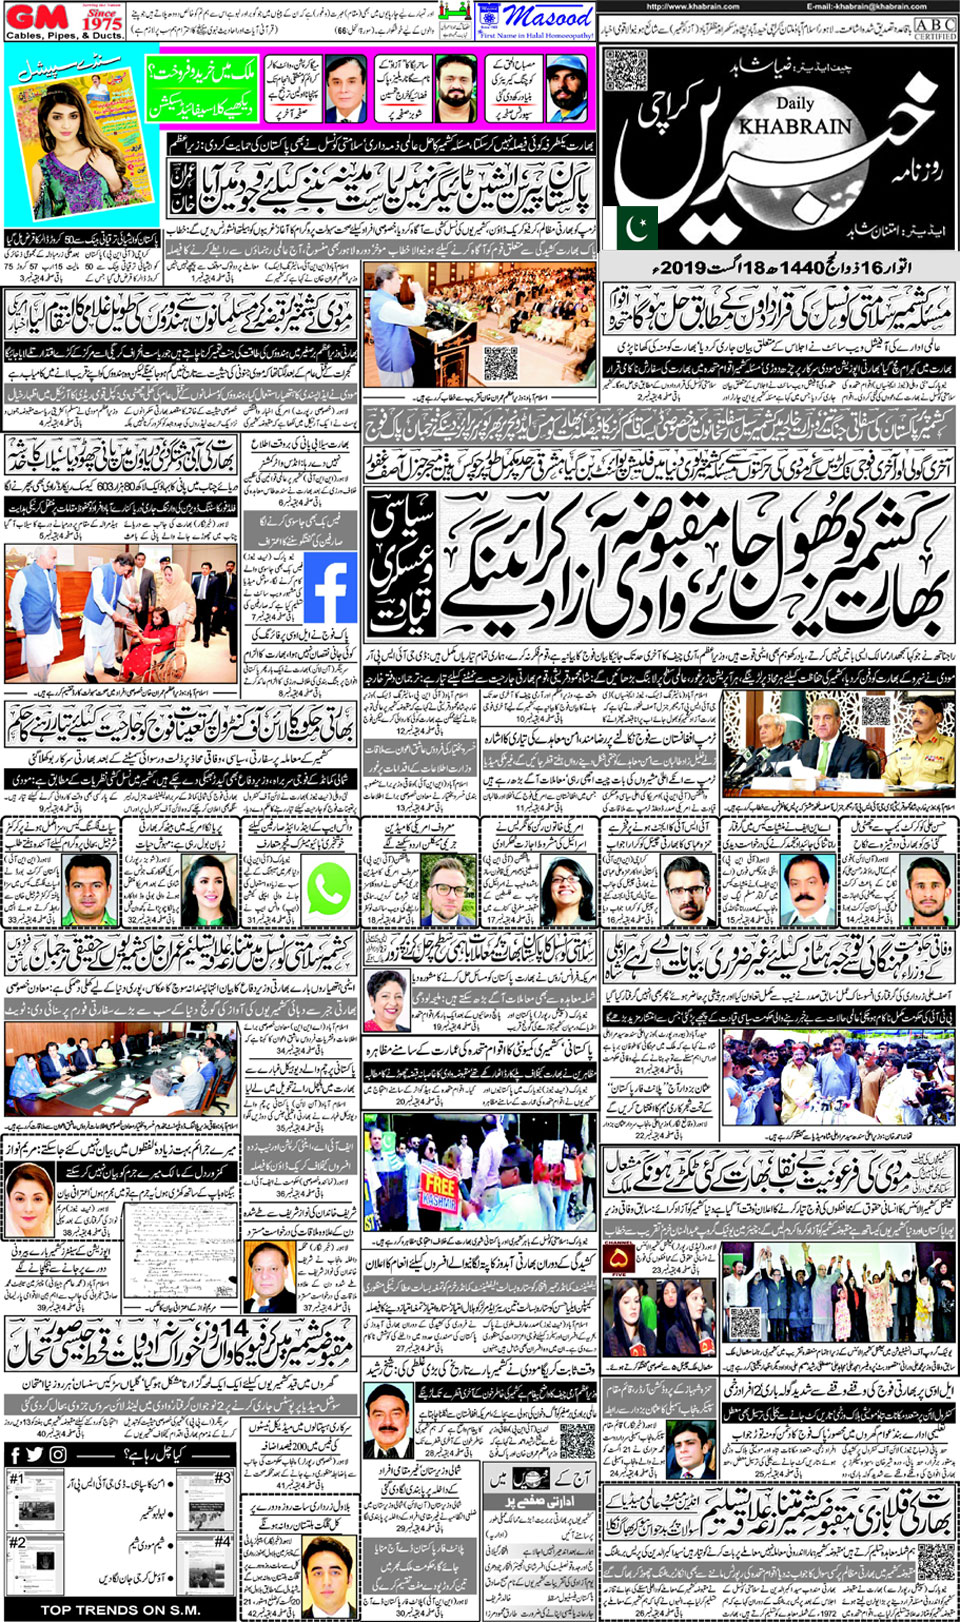 Khabrain Epaper | Daily Khabrain Newspaper | Khabrain E